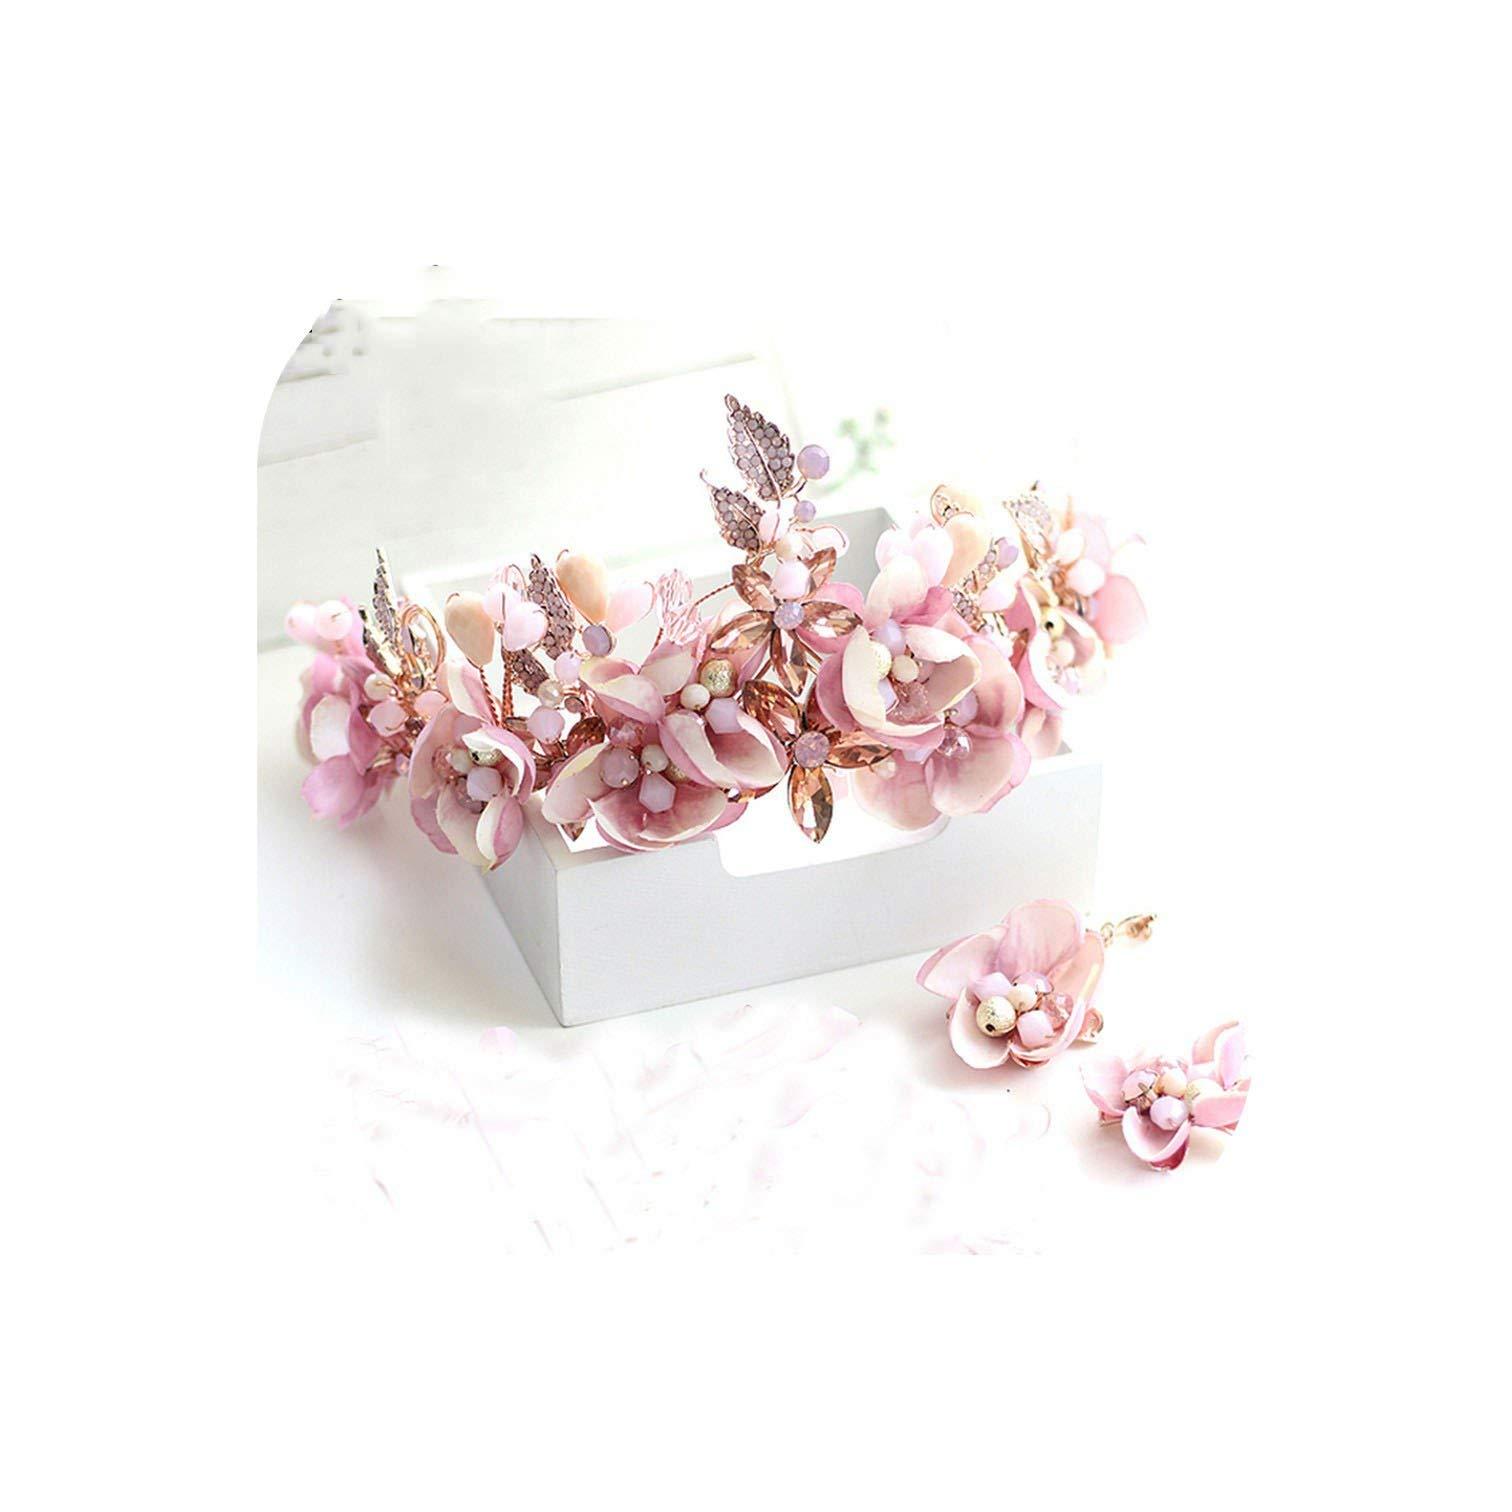 Headwear Romantic Pink Fabric Flower Headband Princess Smaids